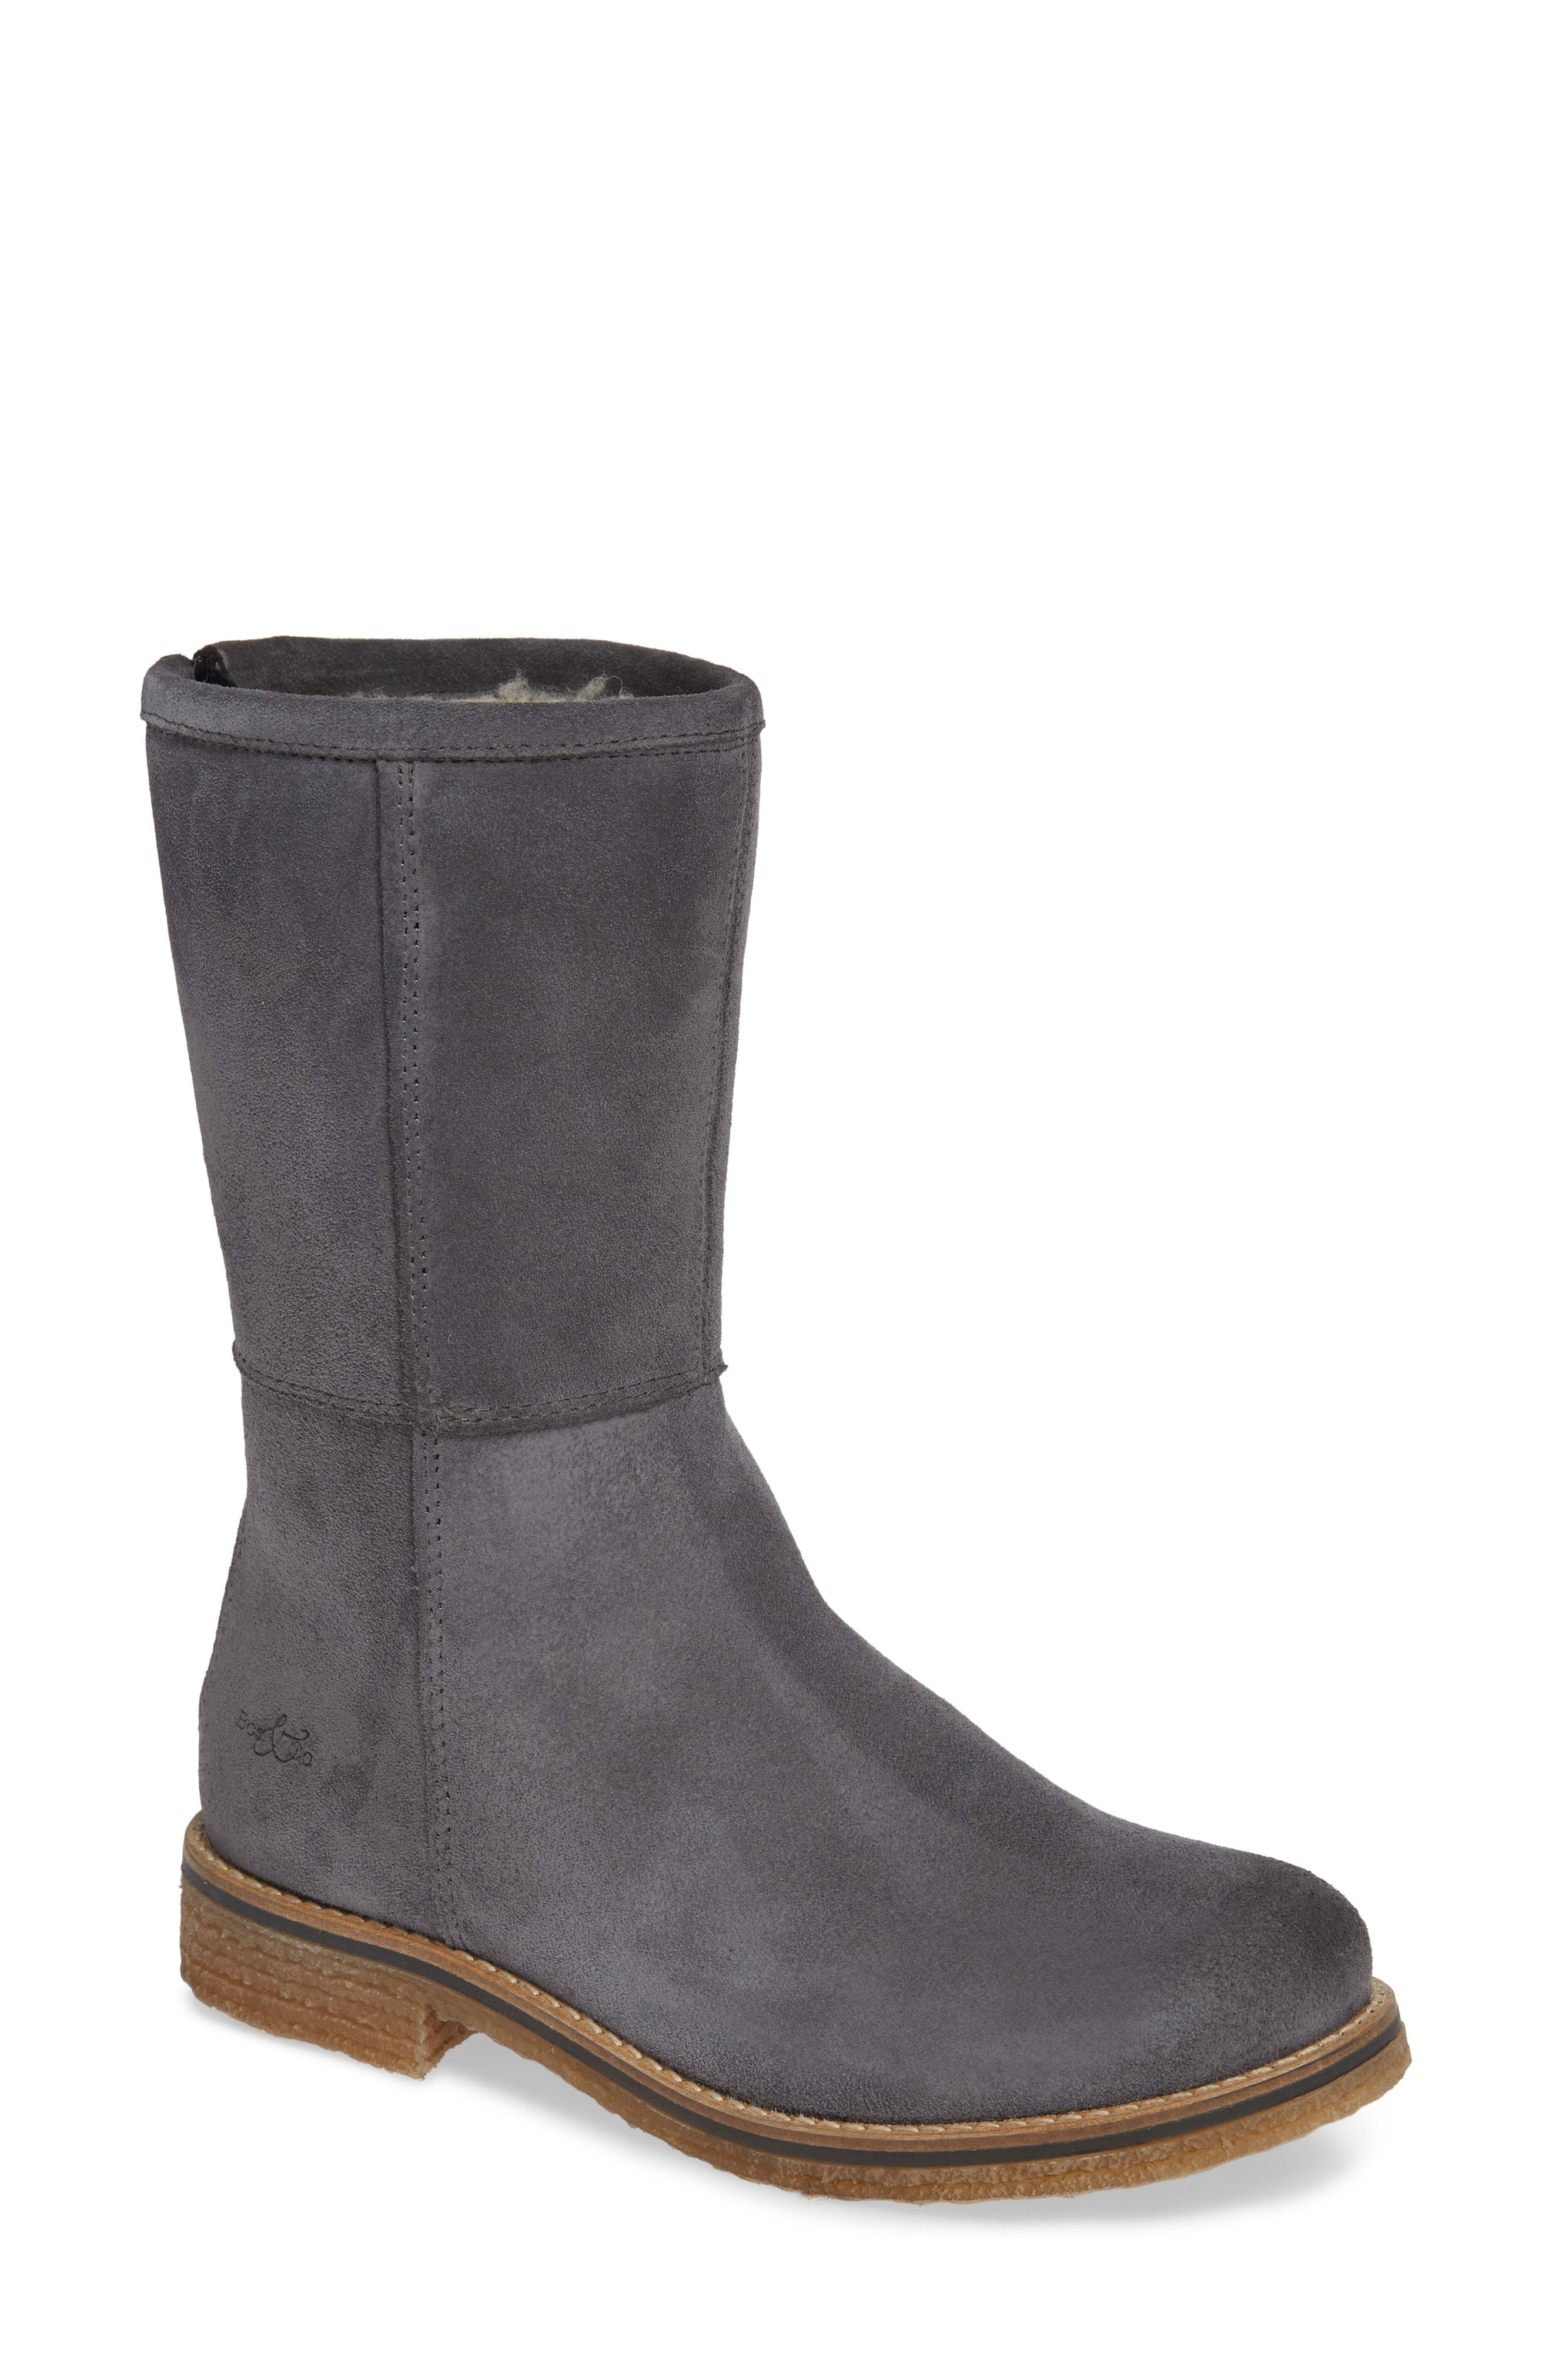 Bos. & Co. Bell Waterproof Winter Boot - Grey